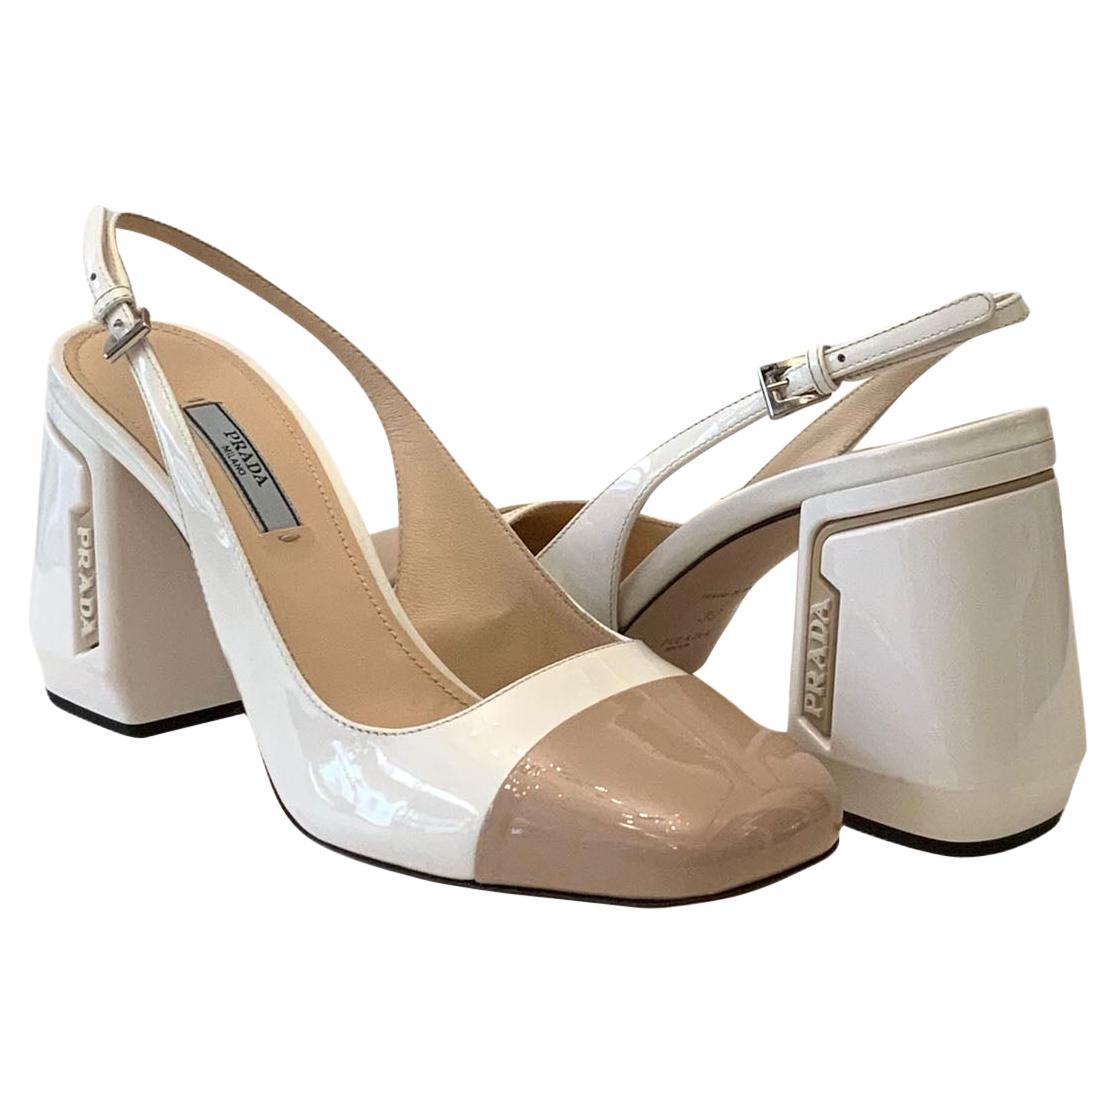 Prada Two Tone Patent Leather Block Heel Slingback Pumps